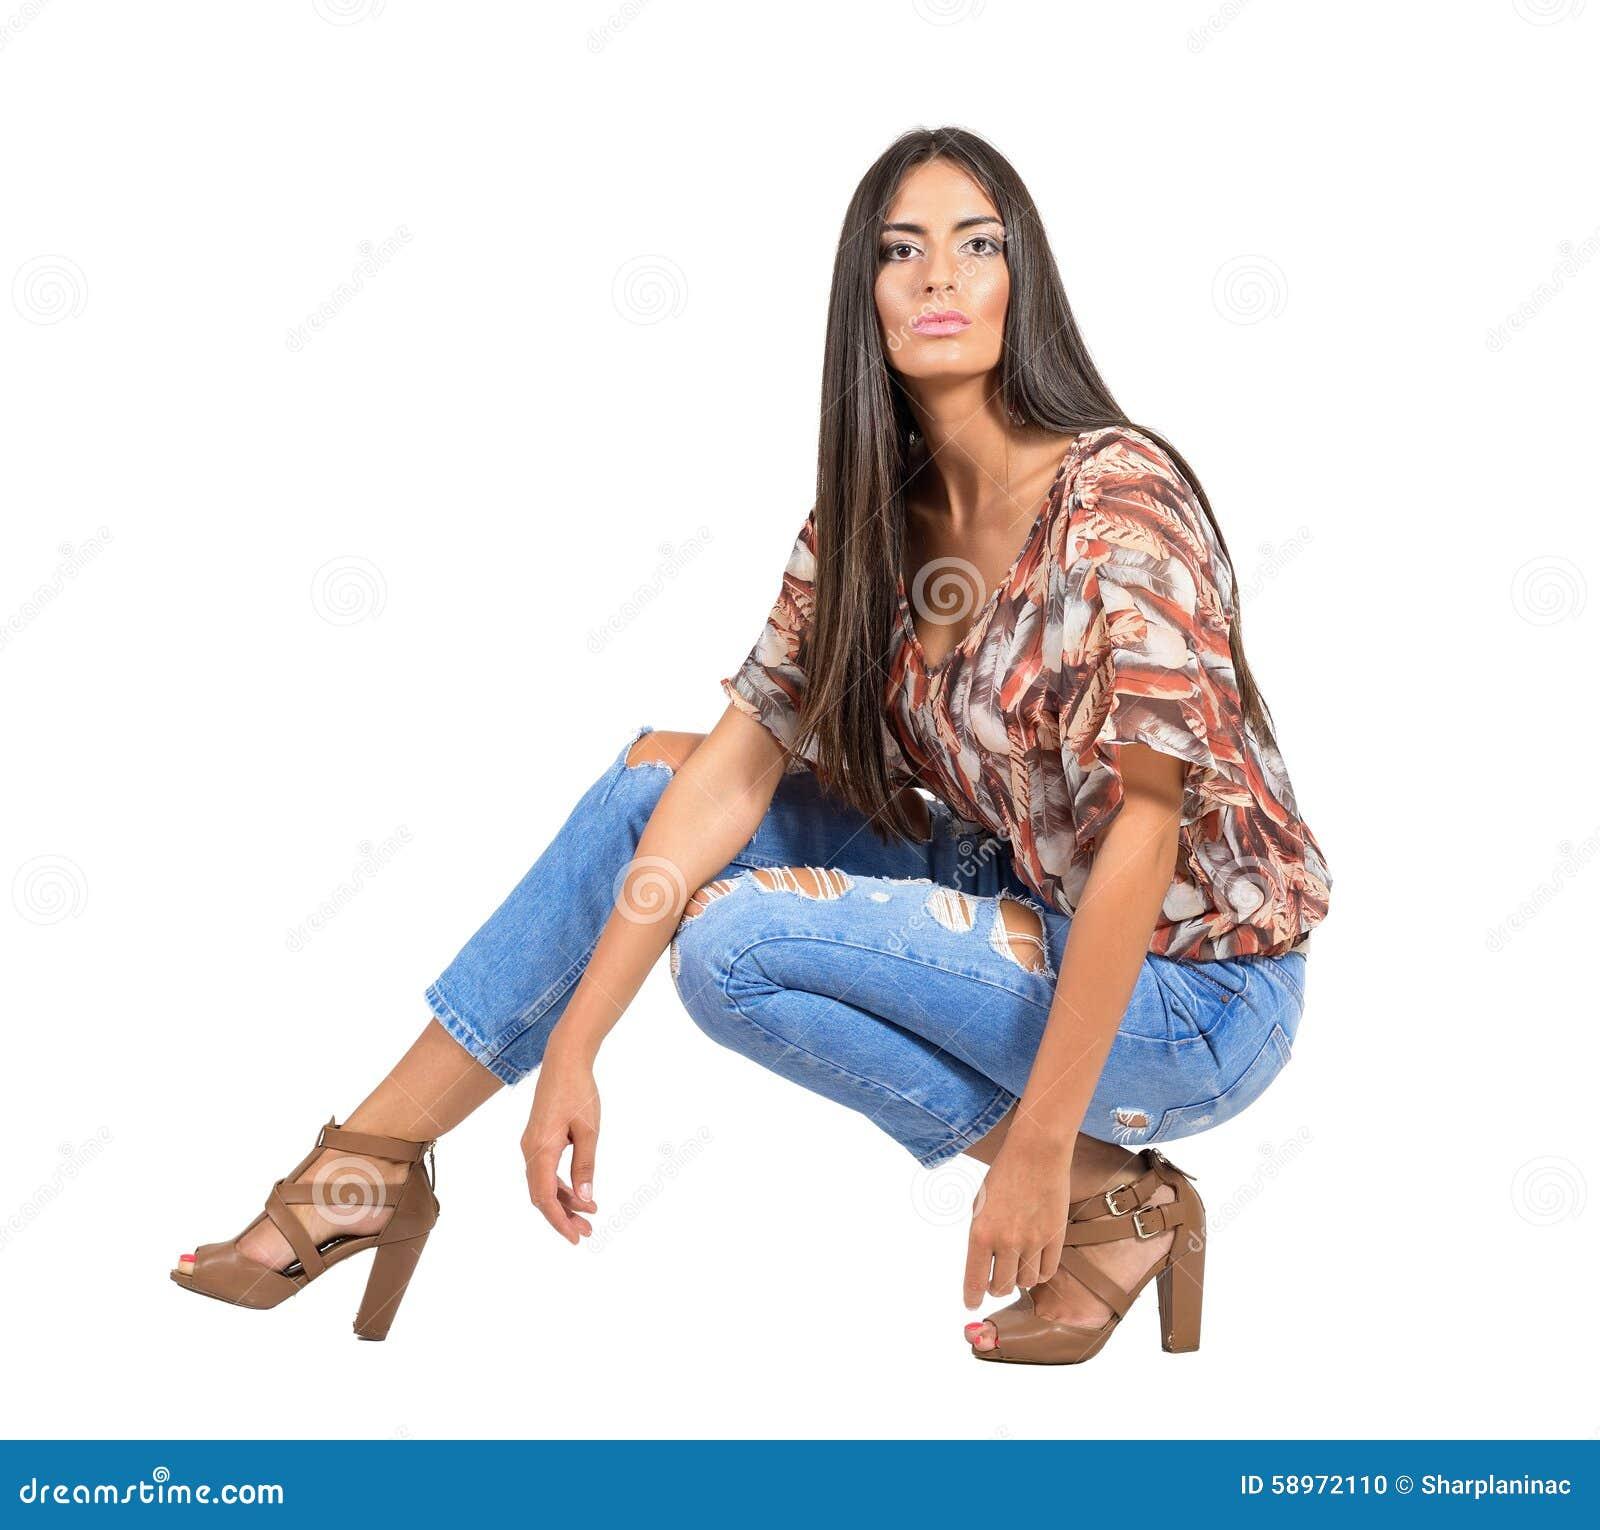 latin girl nude body